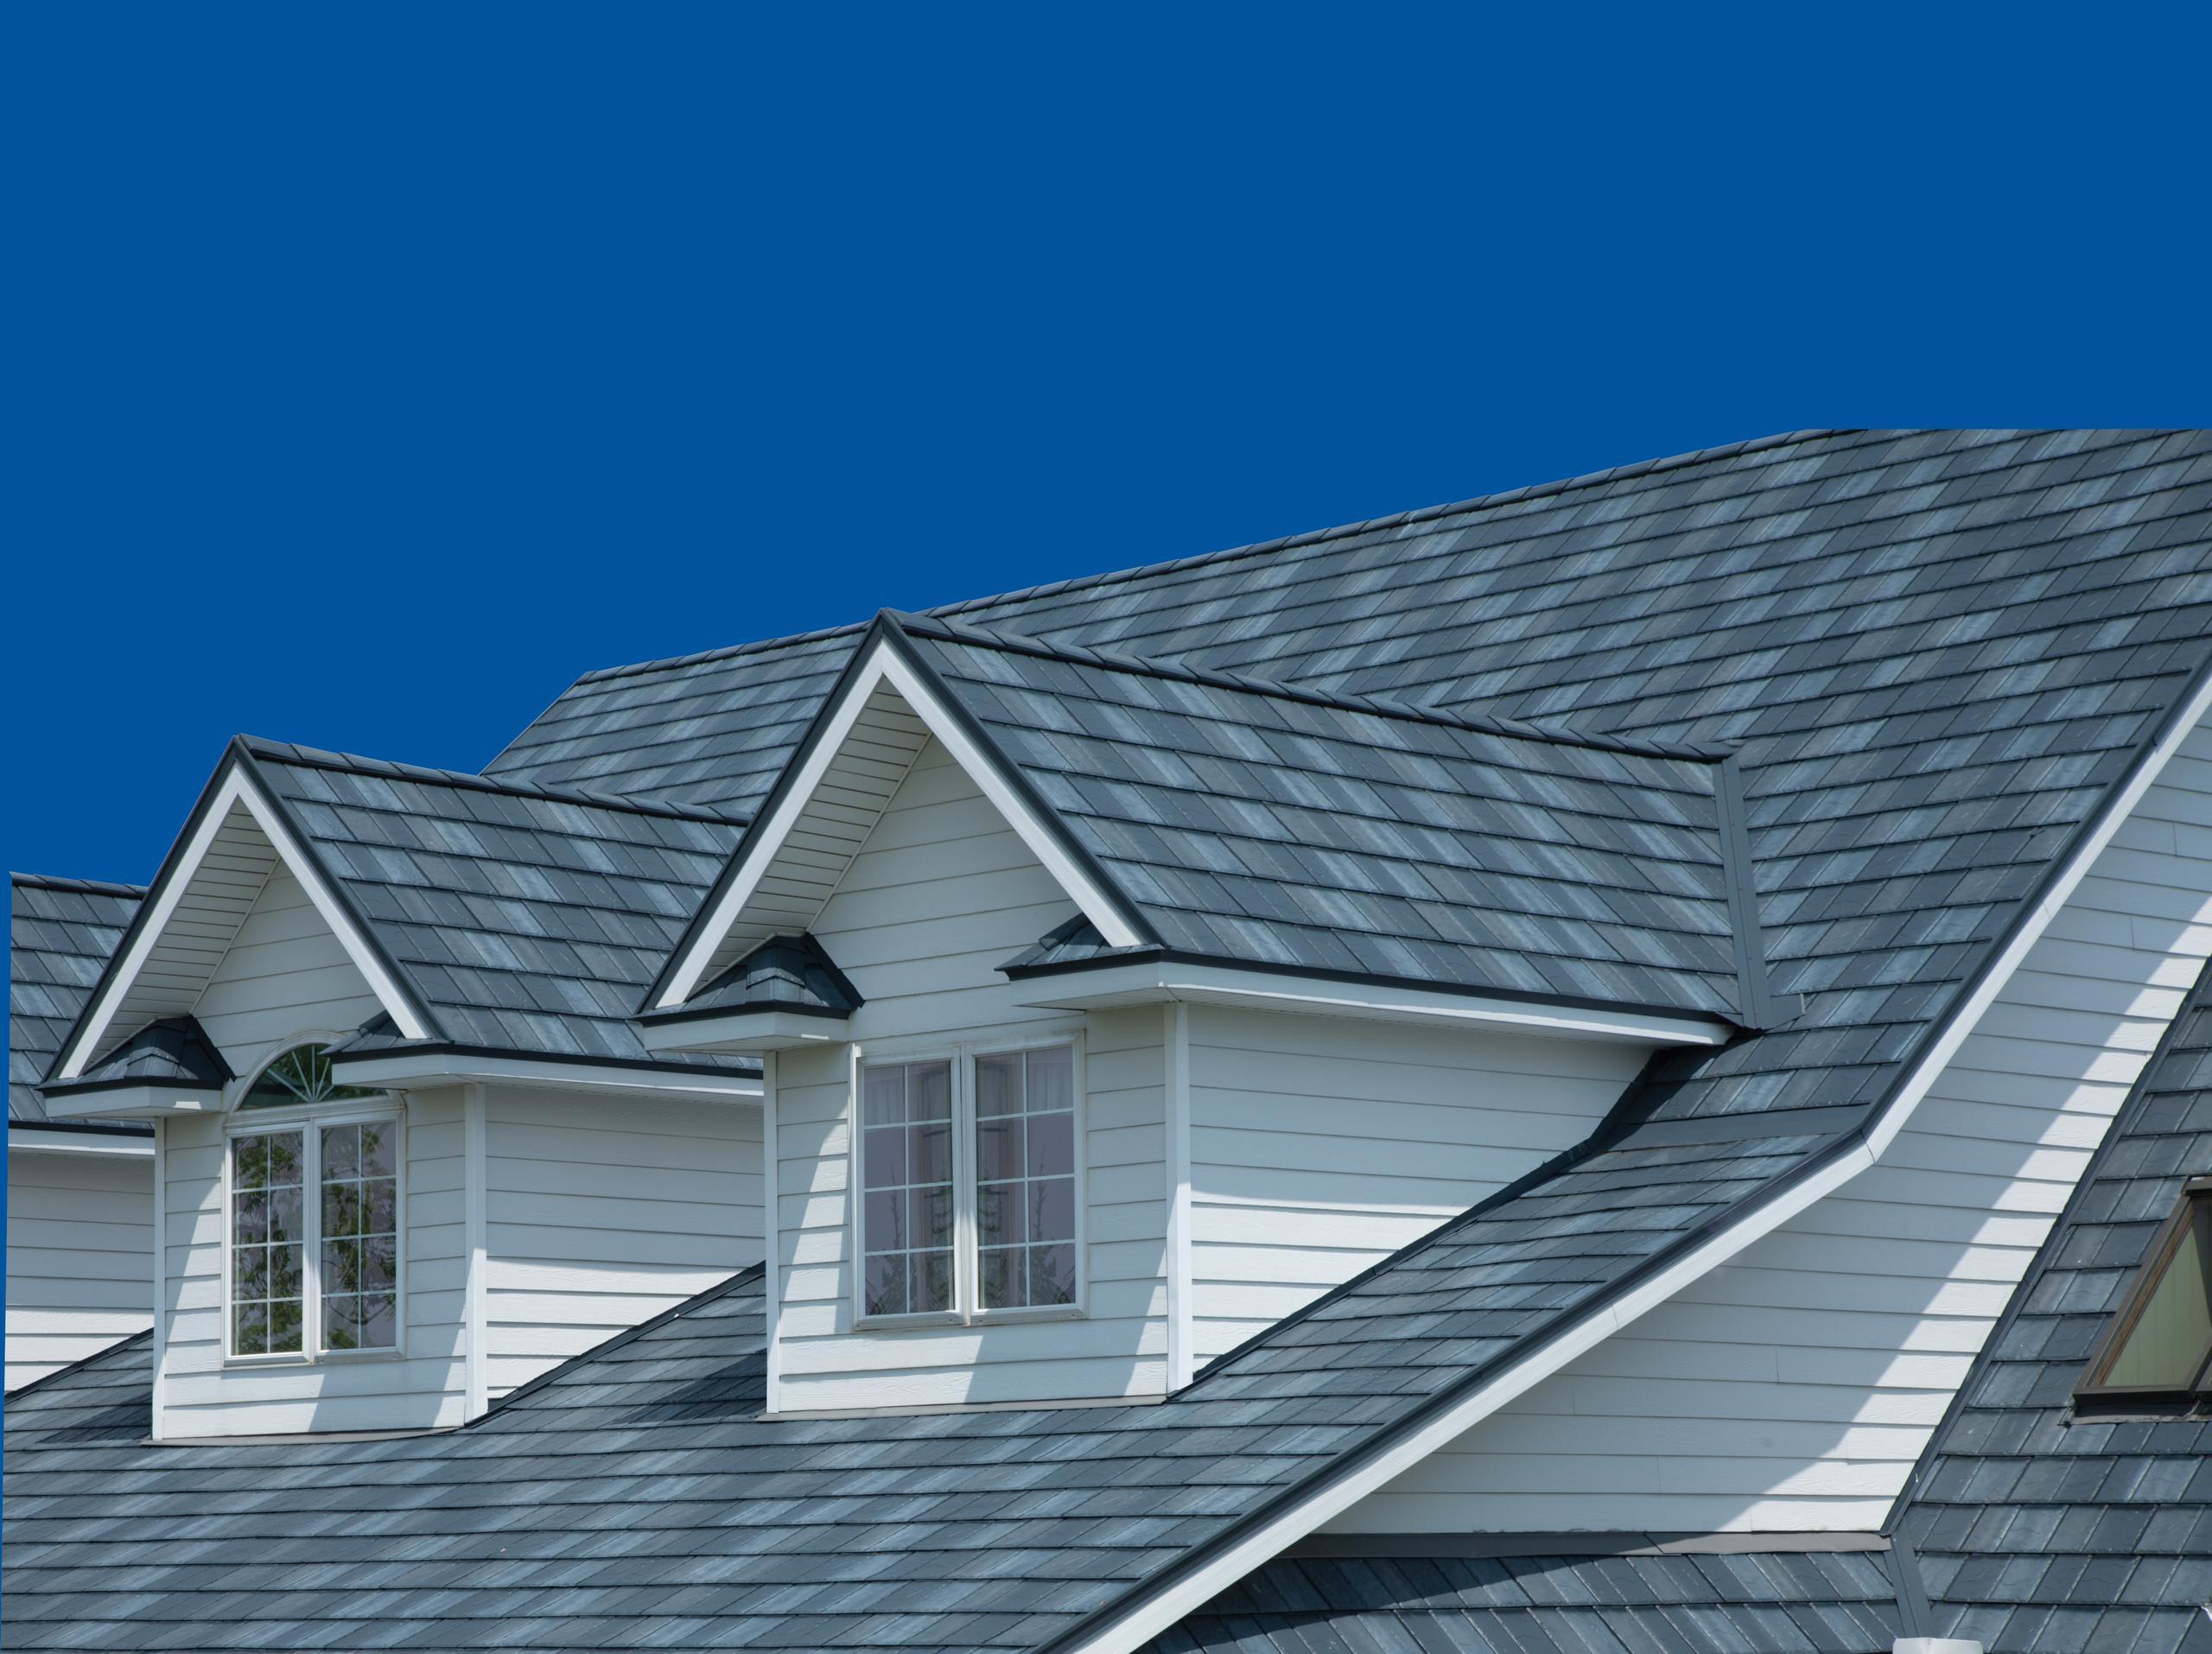 New Roof Combs Roofing of Waxhaw Waxhaw (704)750-9837